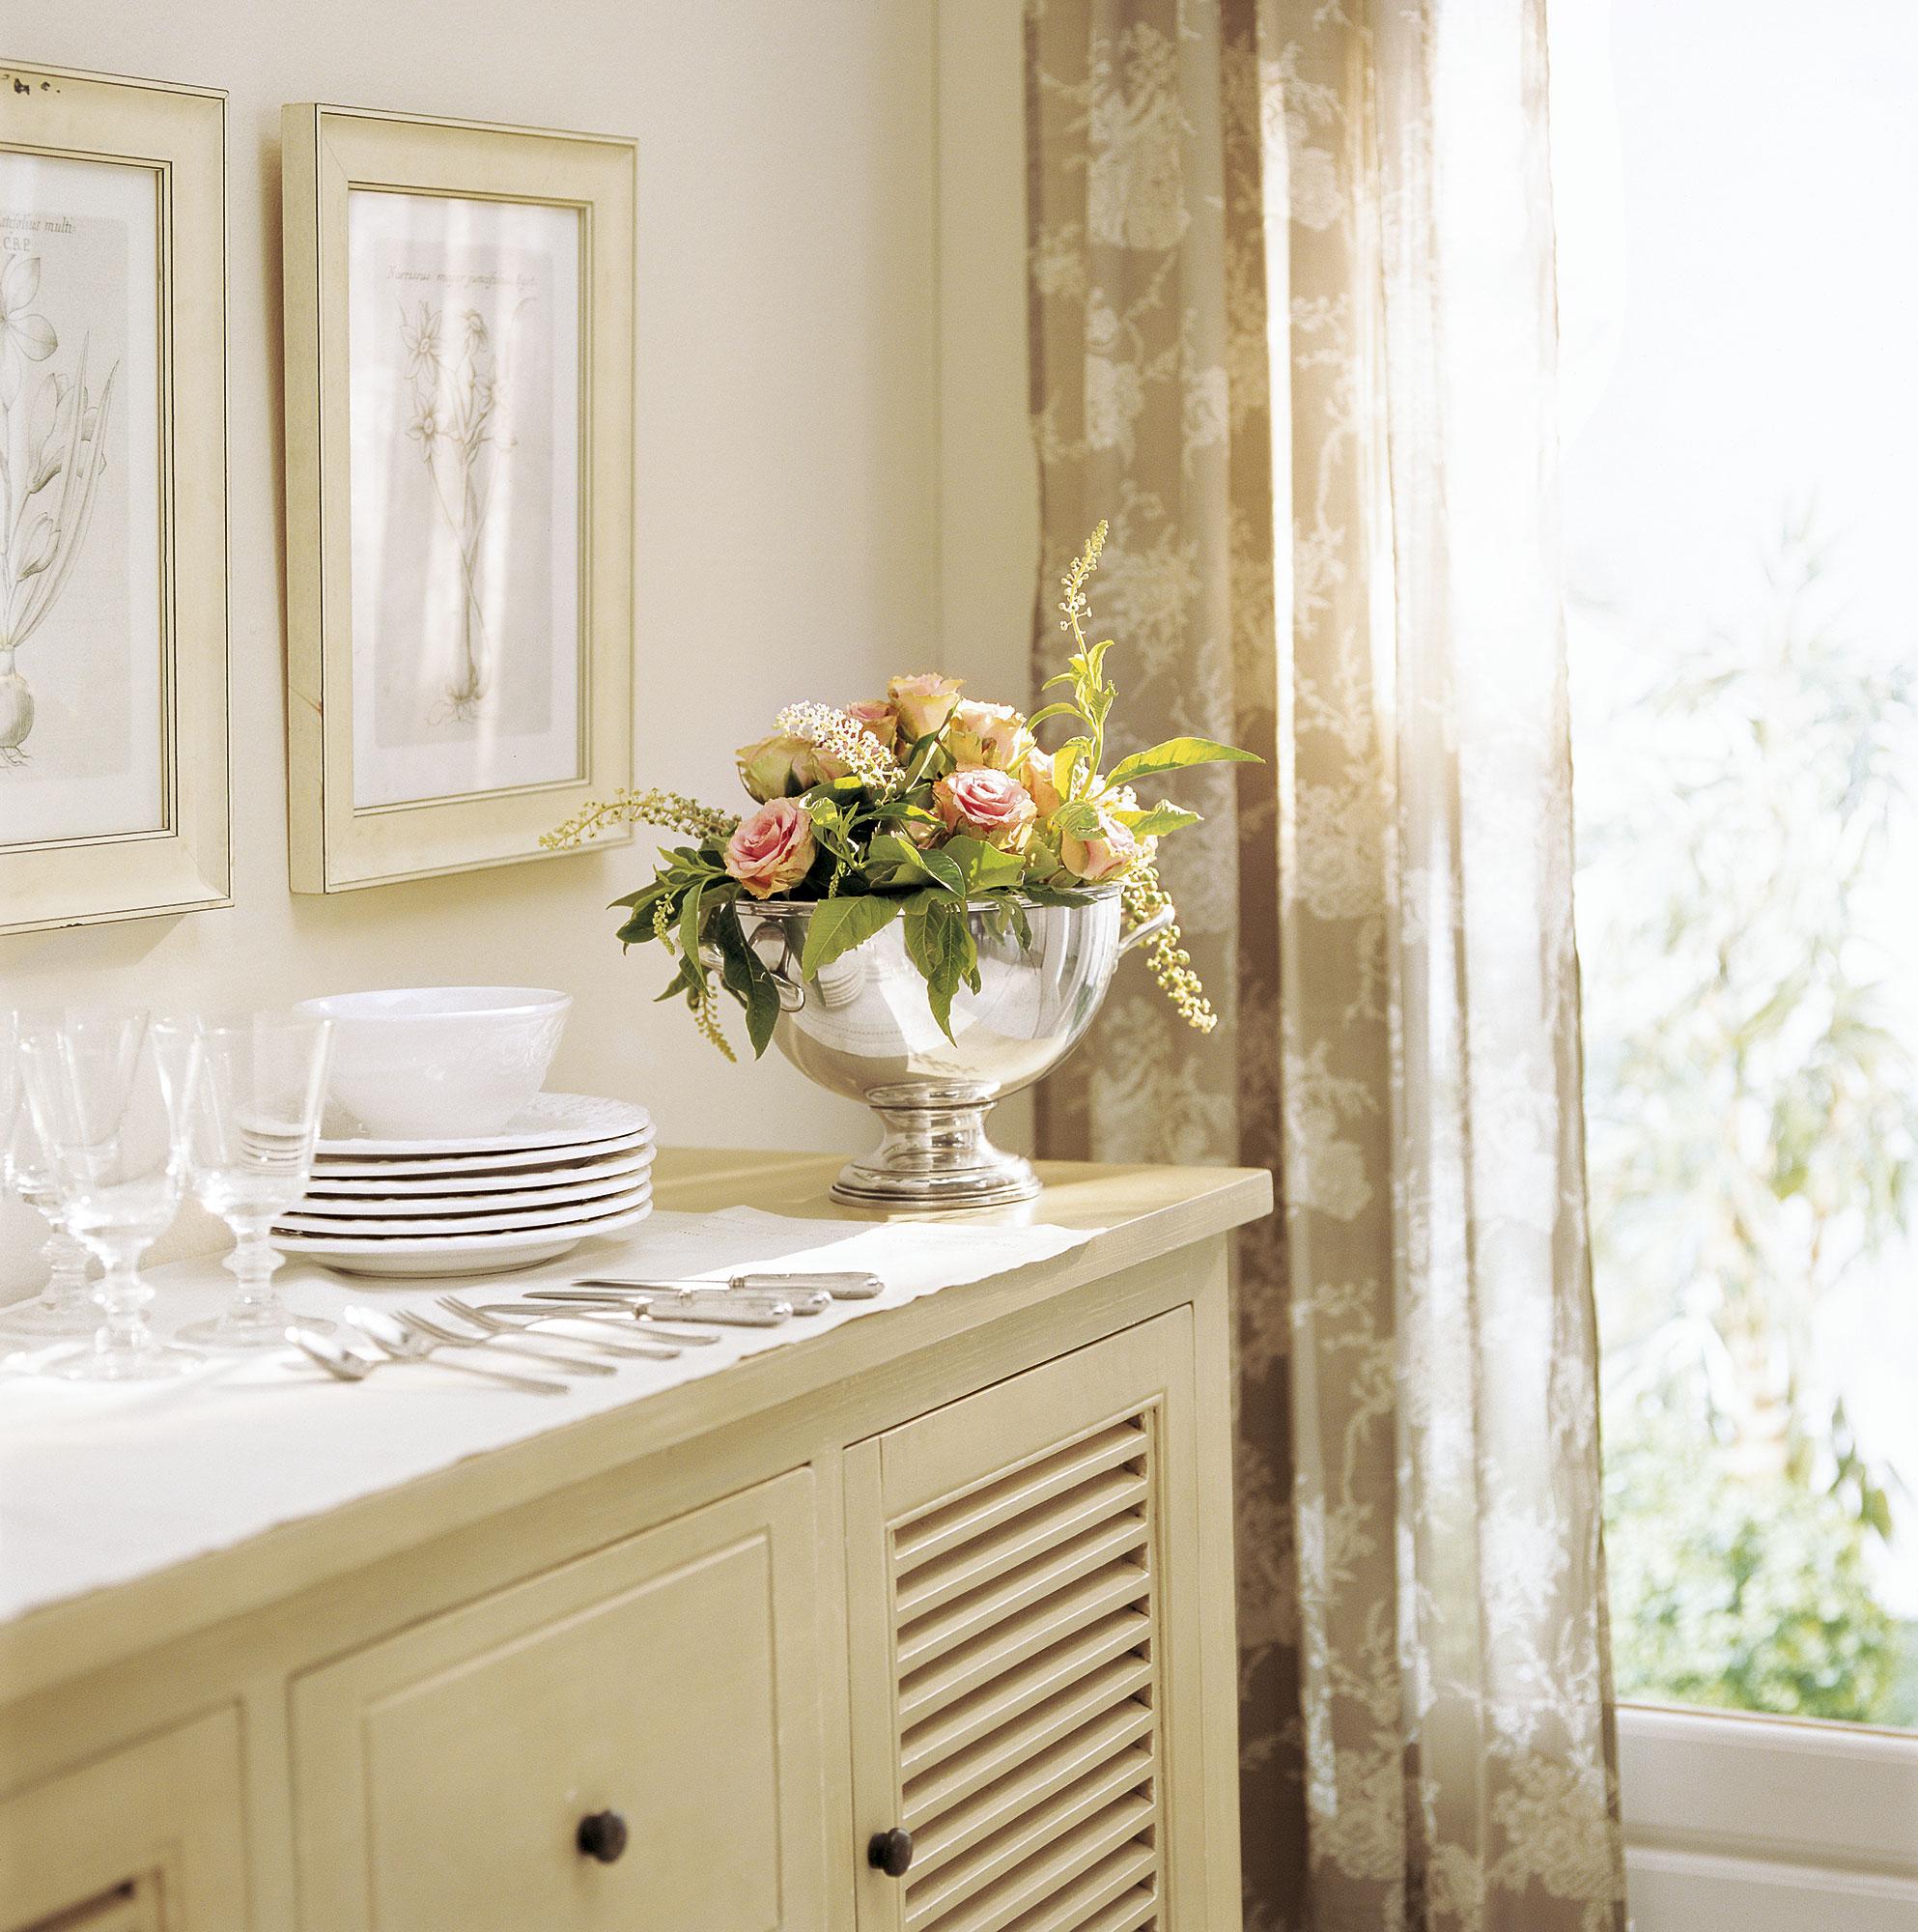 C mo elegir la cortina perfecta para cada ventana - Cortina para ventana de bano ...